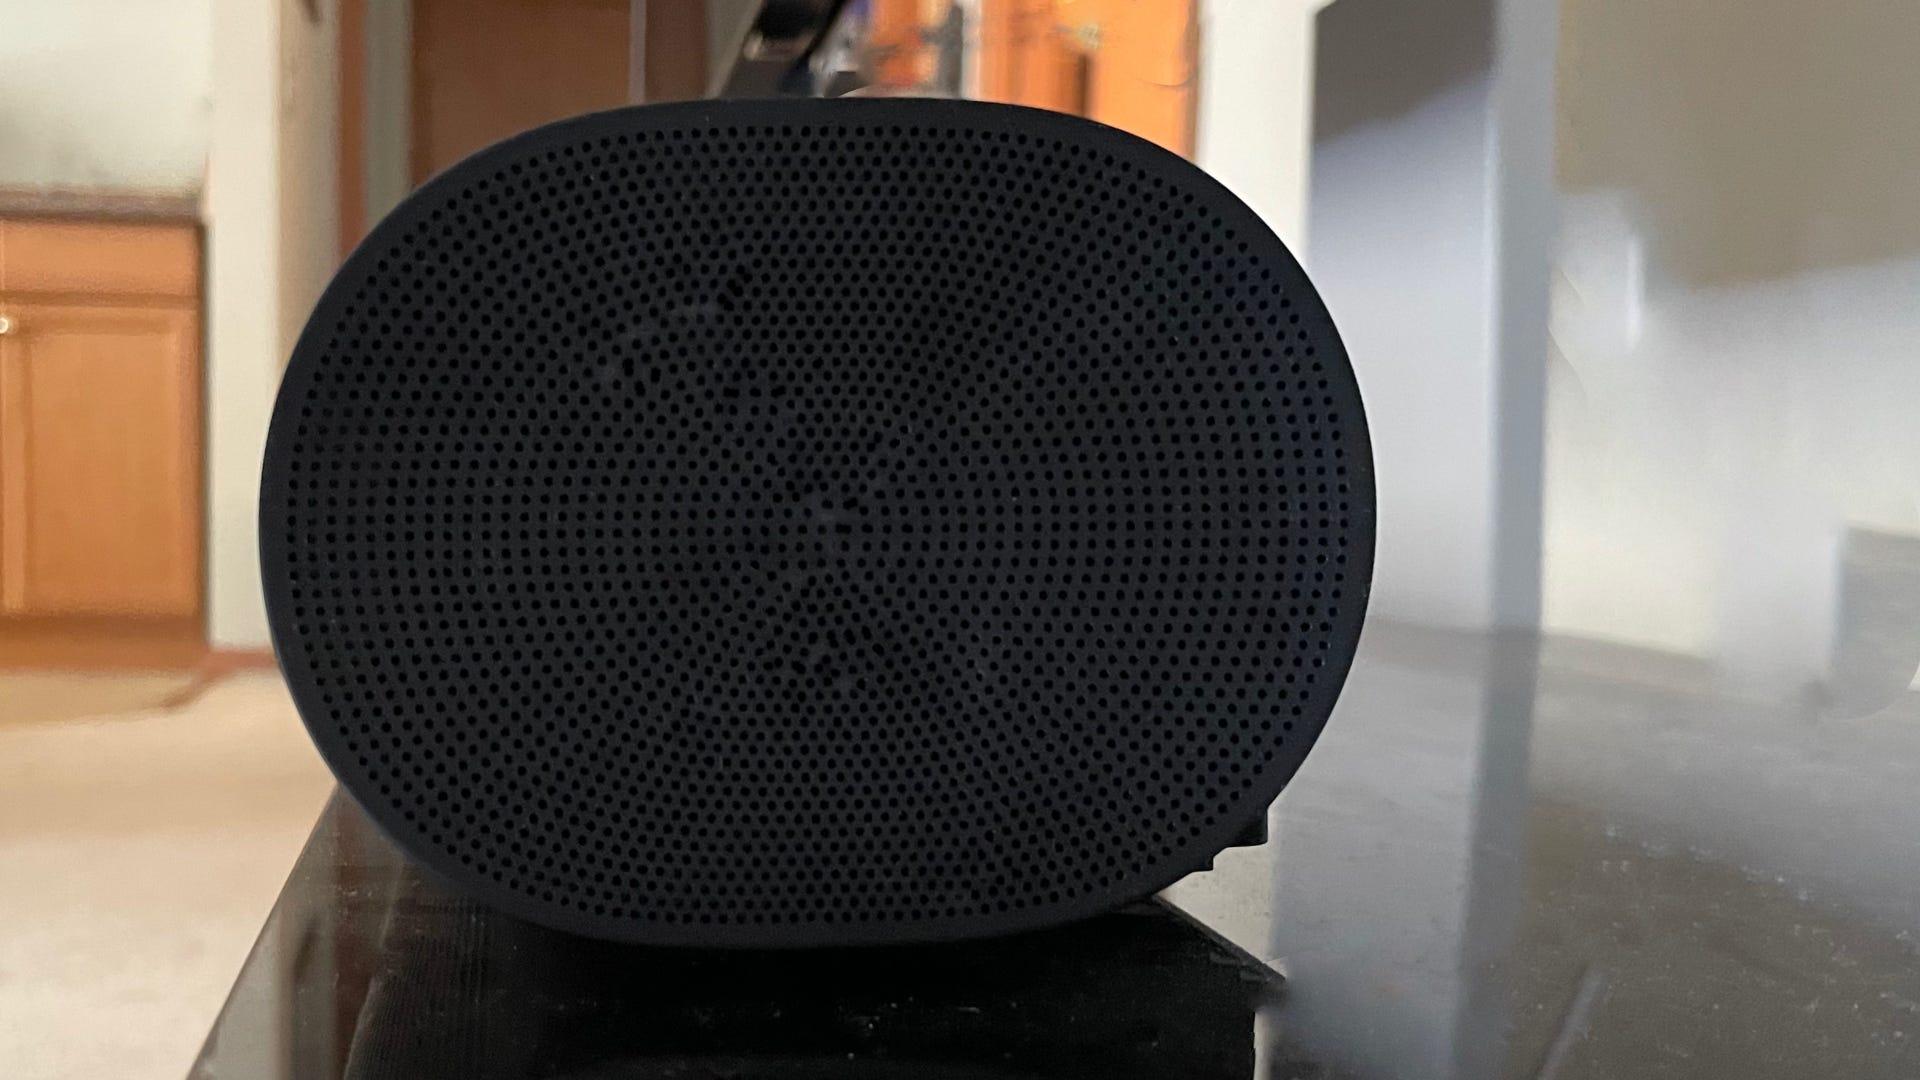 Side profile of Sonos ARC soundbar